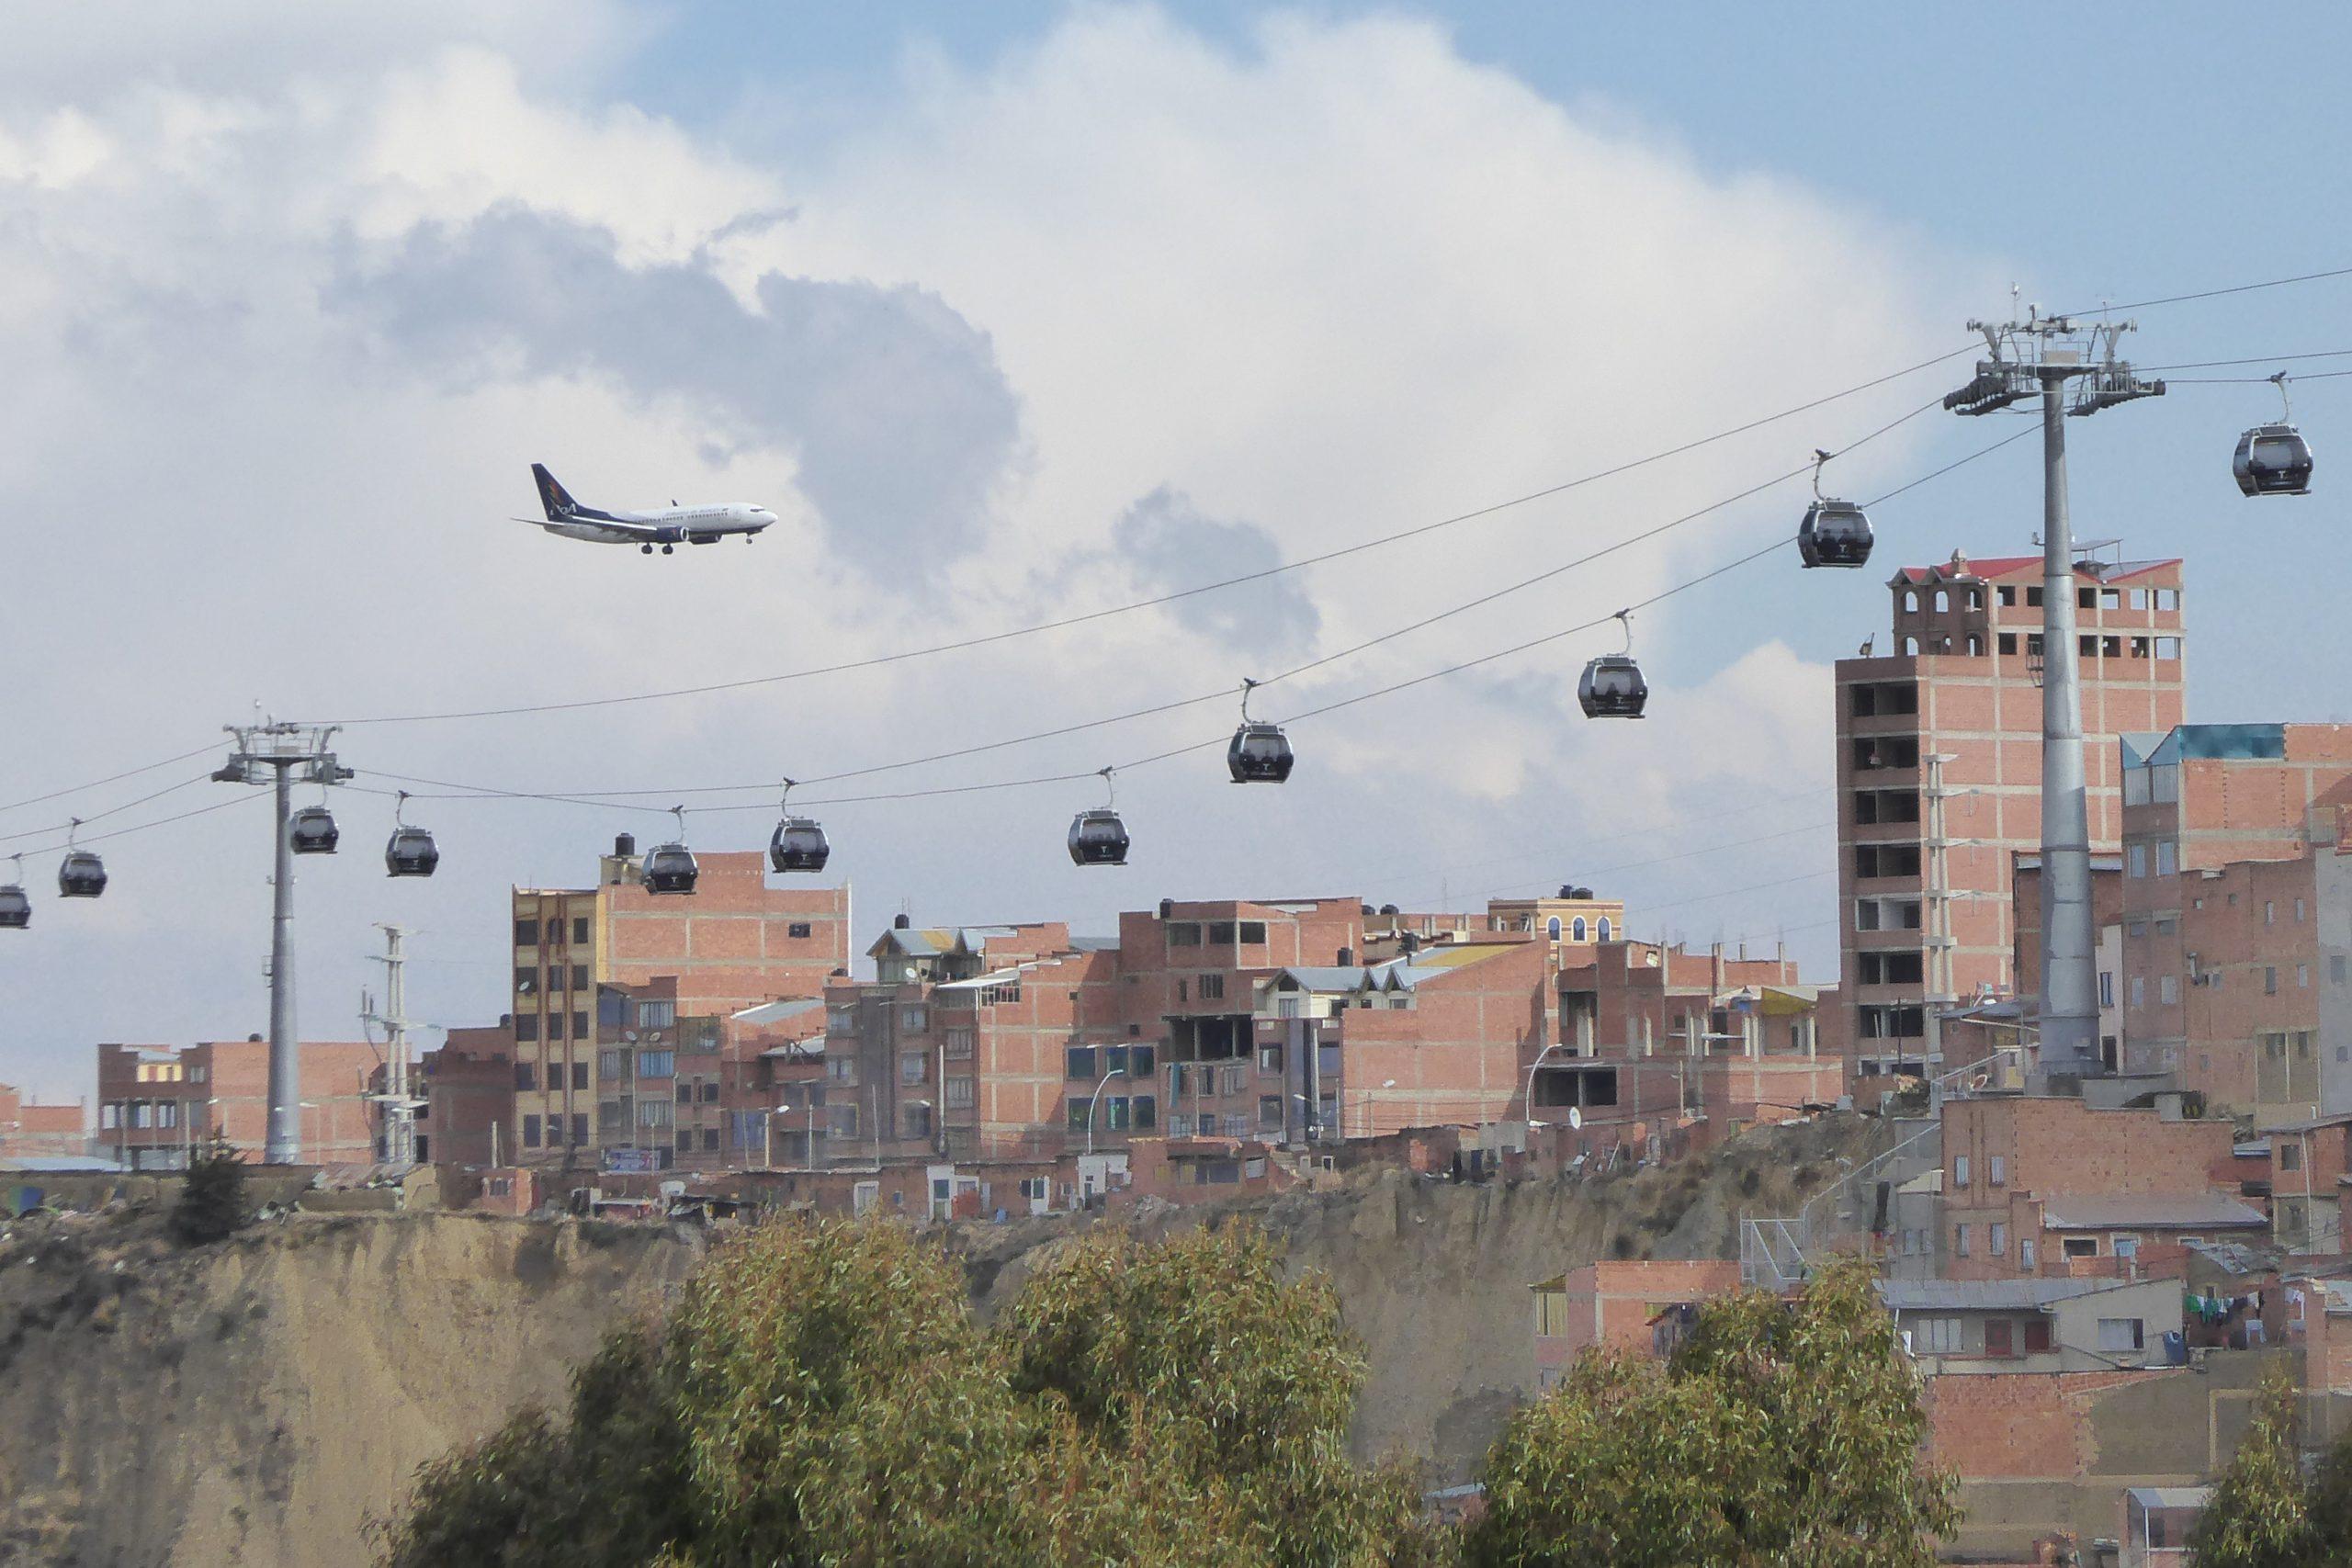 Radreise Südamerika 2019 - El Alto und La Paz mit Seilbahn